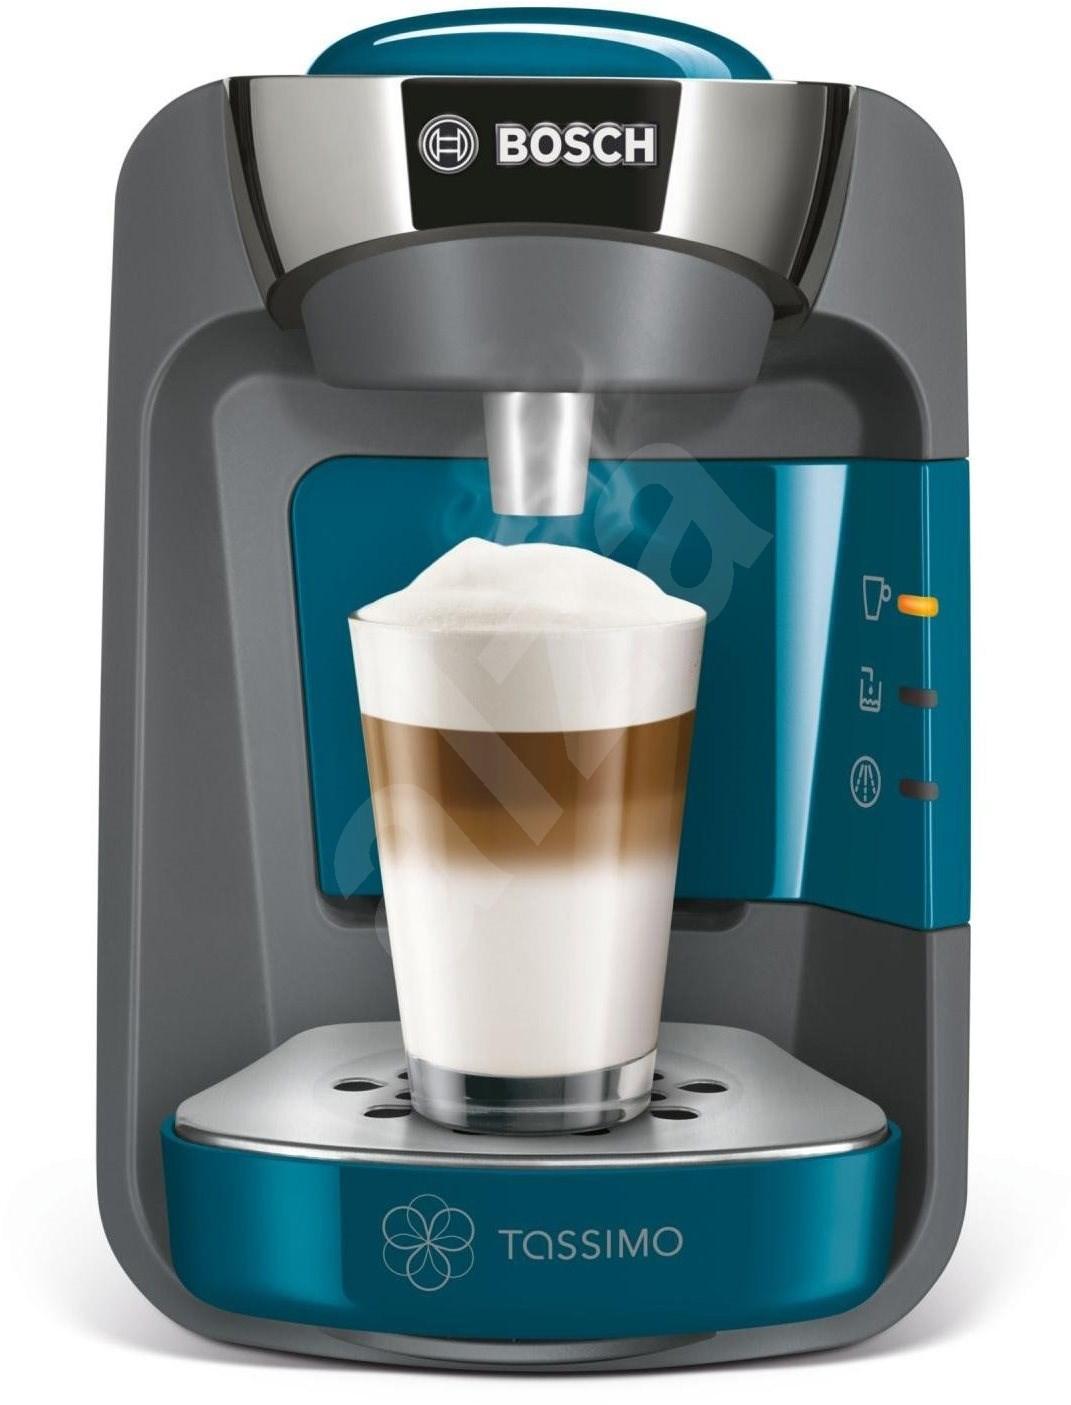 Bosch TASSIMO TAS3205 - Capsule Coffee Machine | Alzashop.com